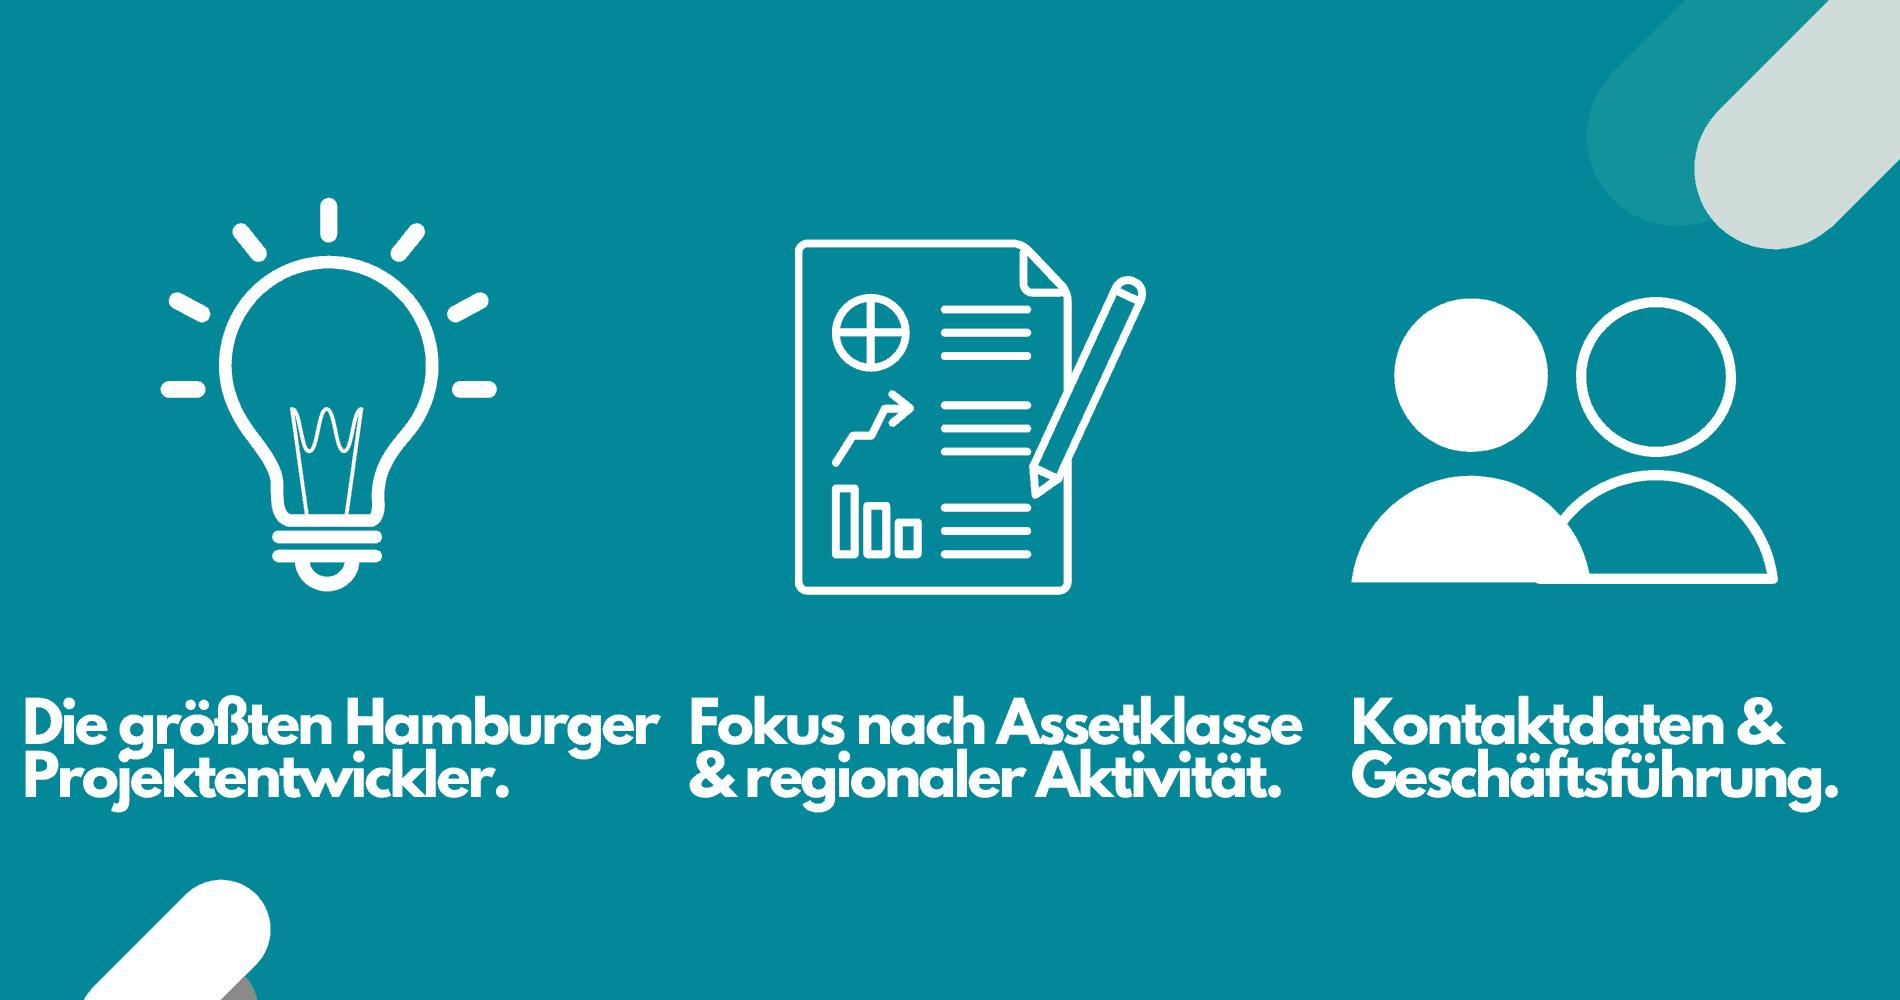 Daten Projektentwickler Hamburg